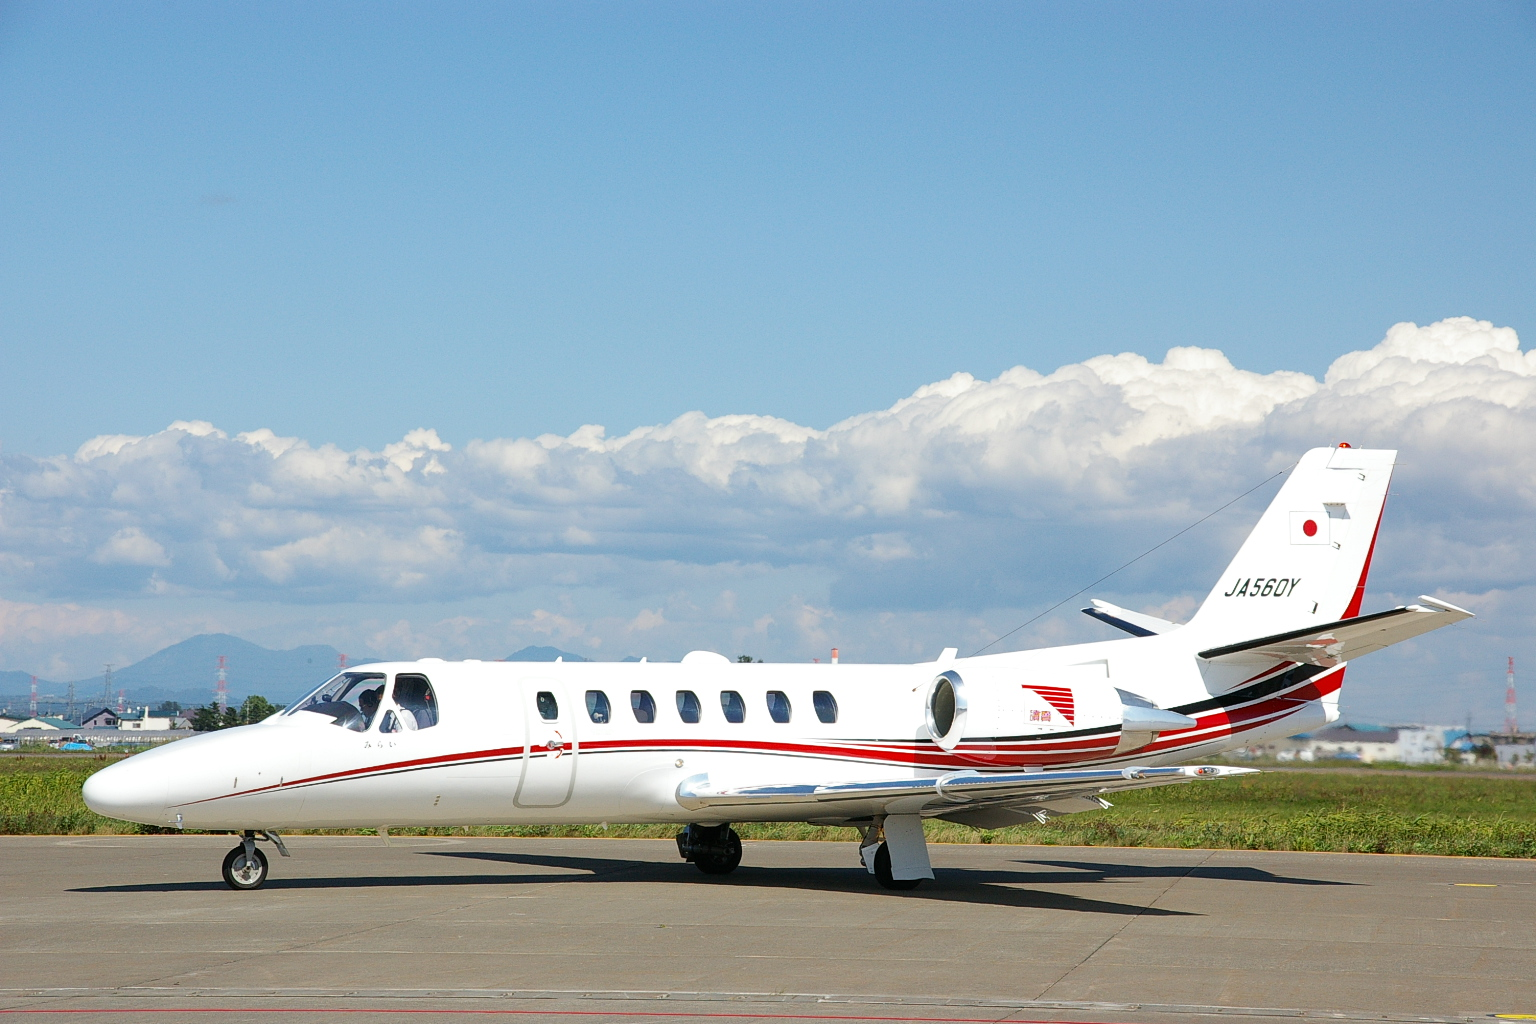 File:Cessna Citation V.JPG